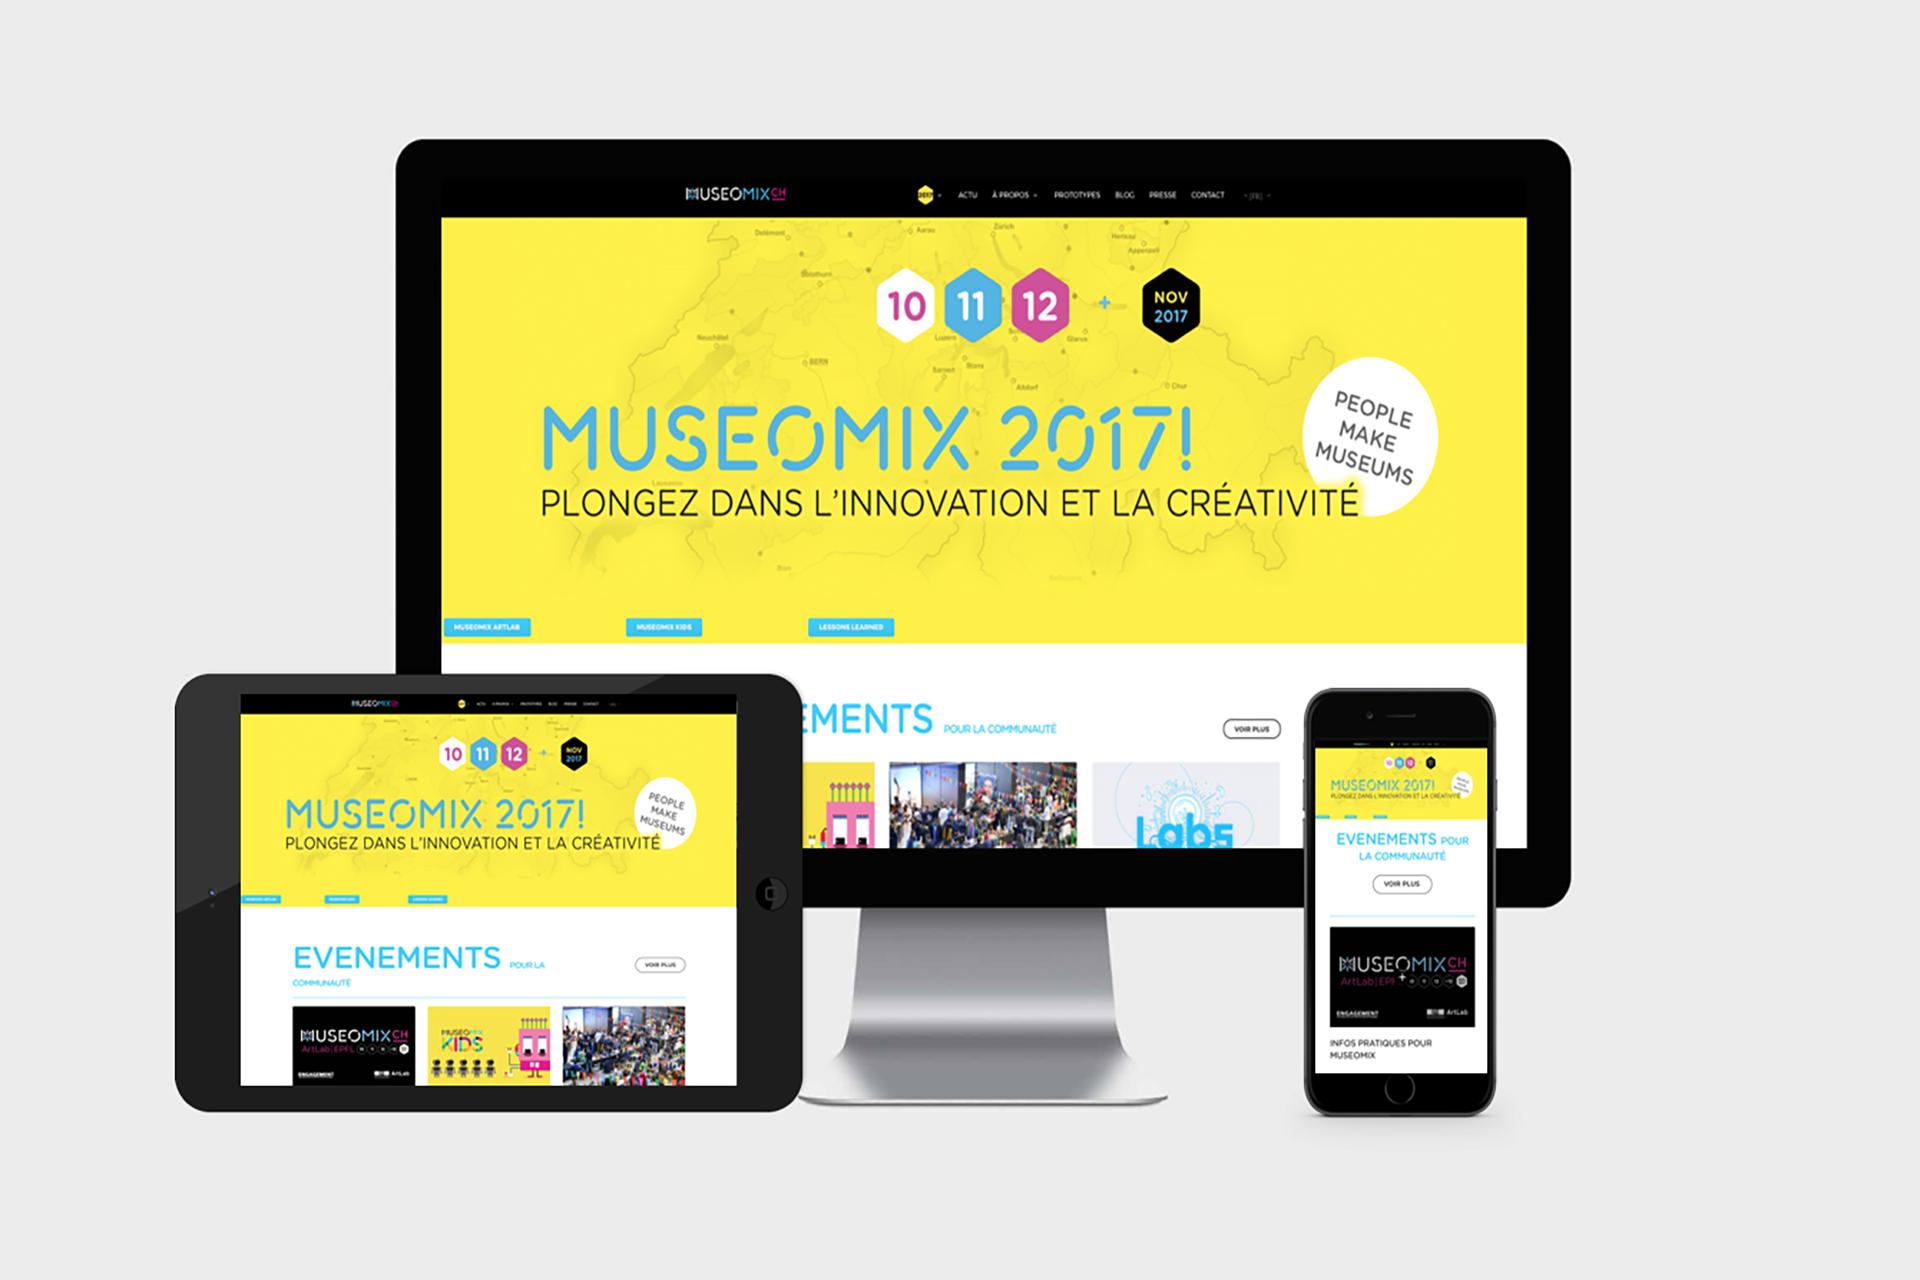 stratégie de communication Museomix